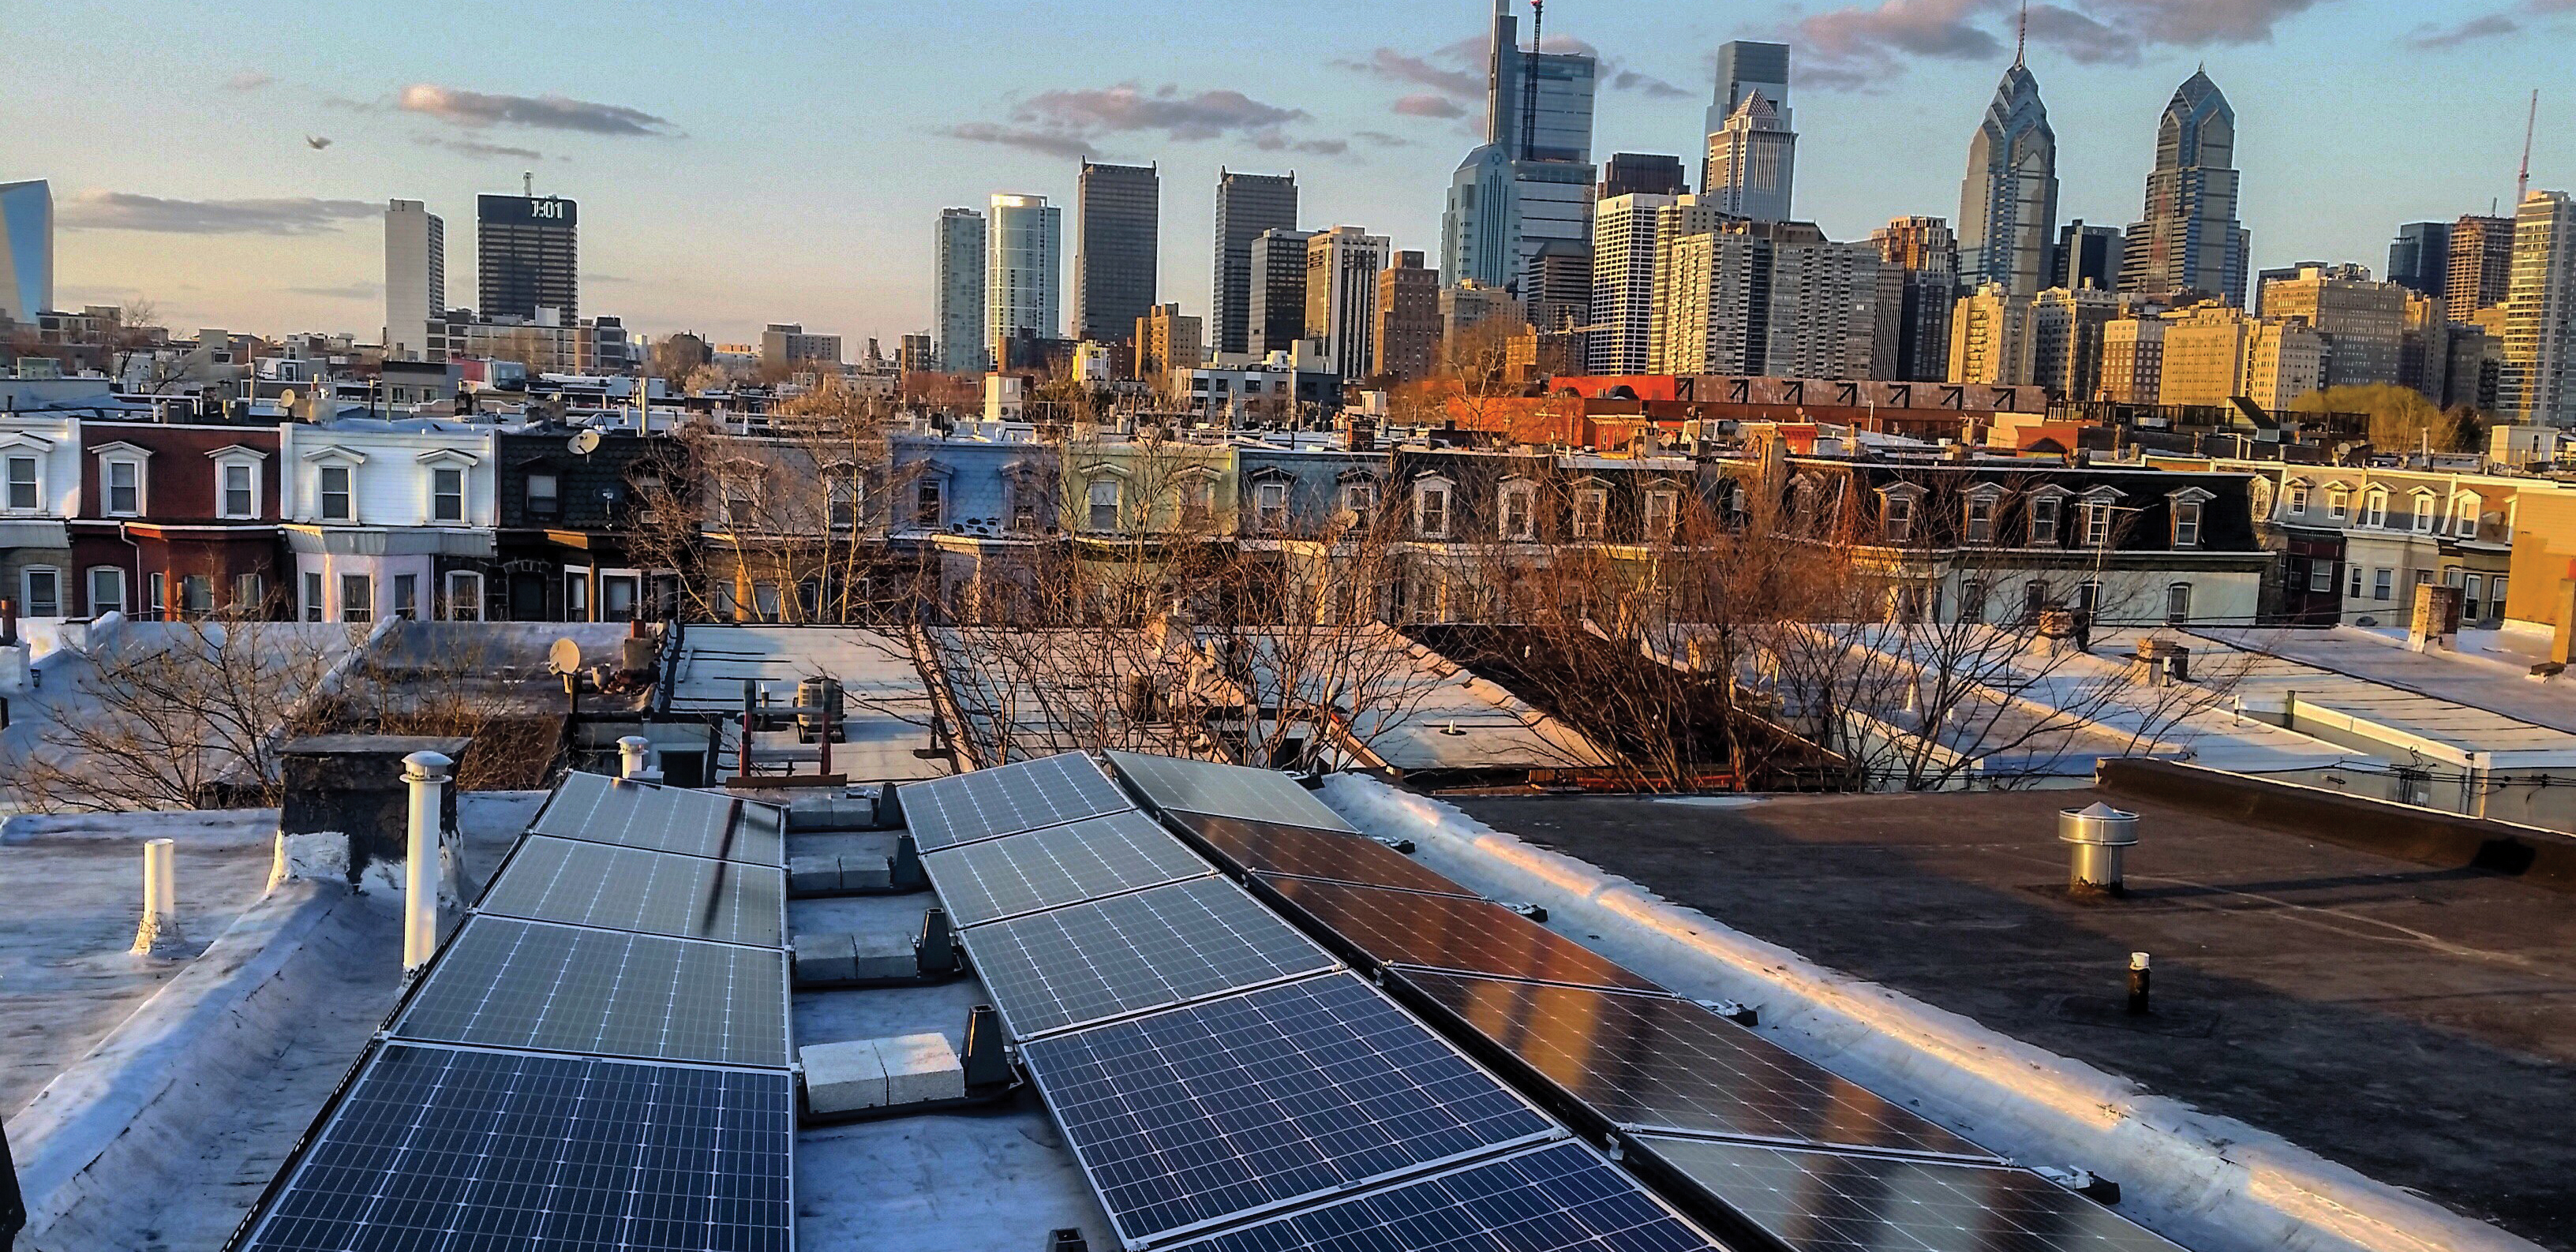 Solarize Philly Skyline Photo